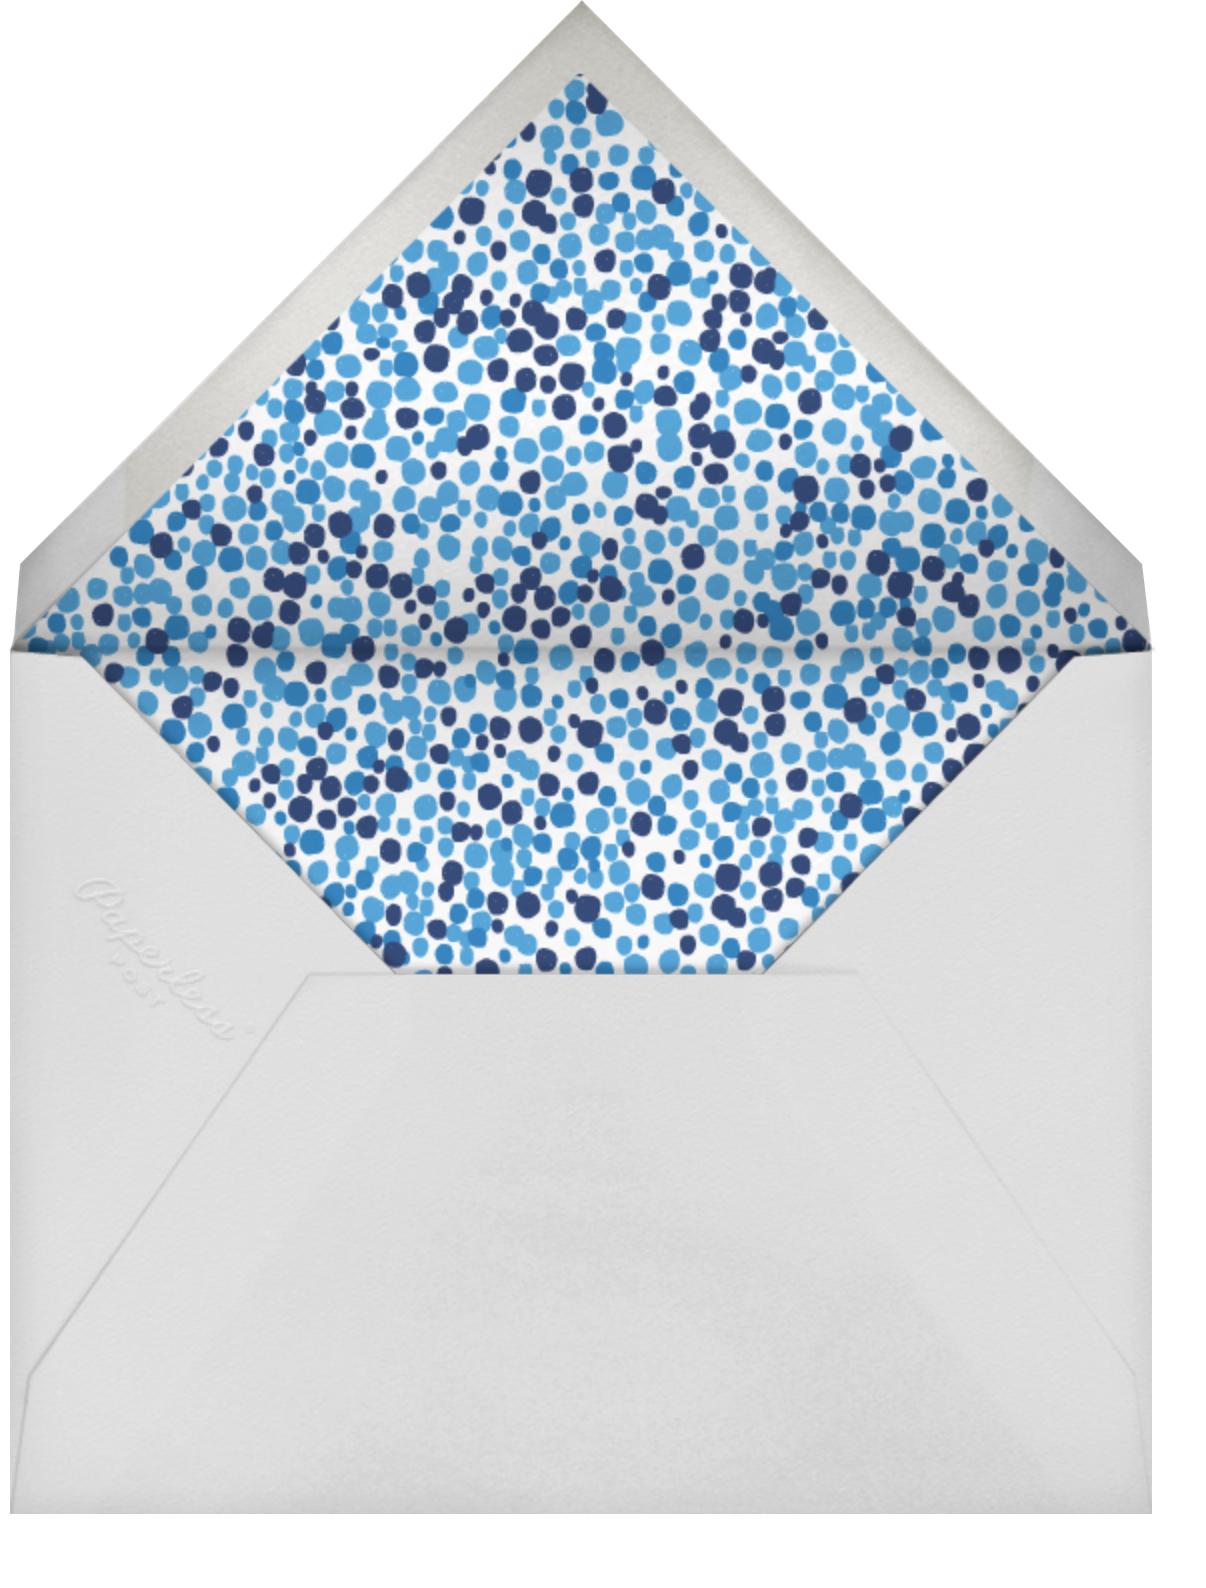 Gimlet for the Grad - Tan - Mr. Boddington's Studio - Graduation - envelope back